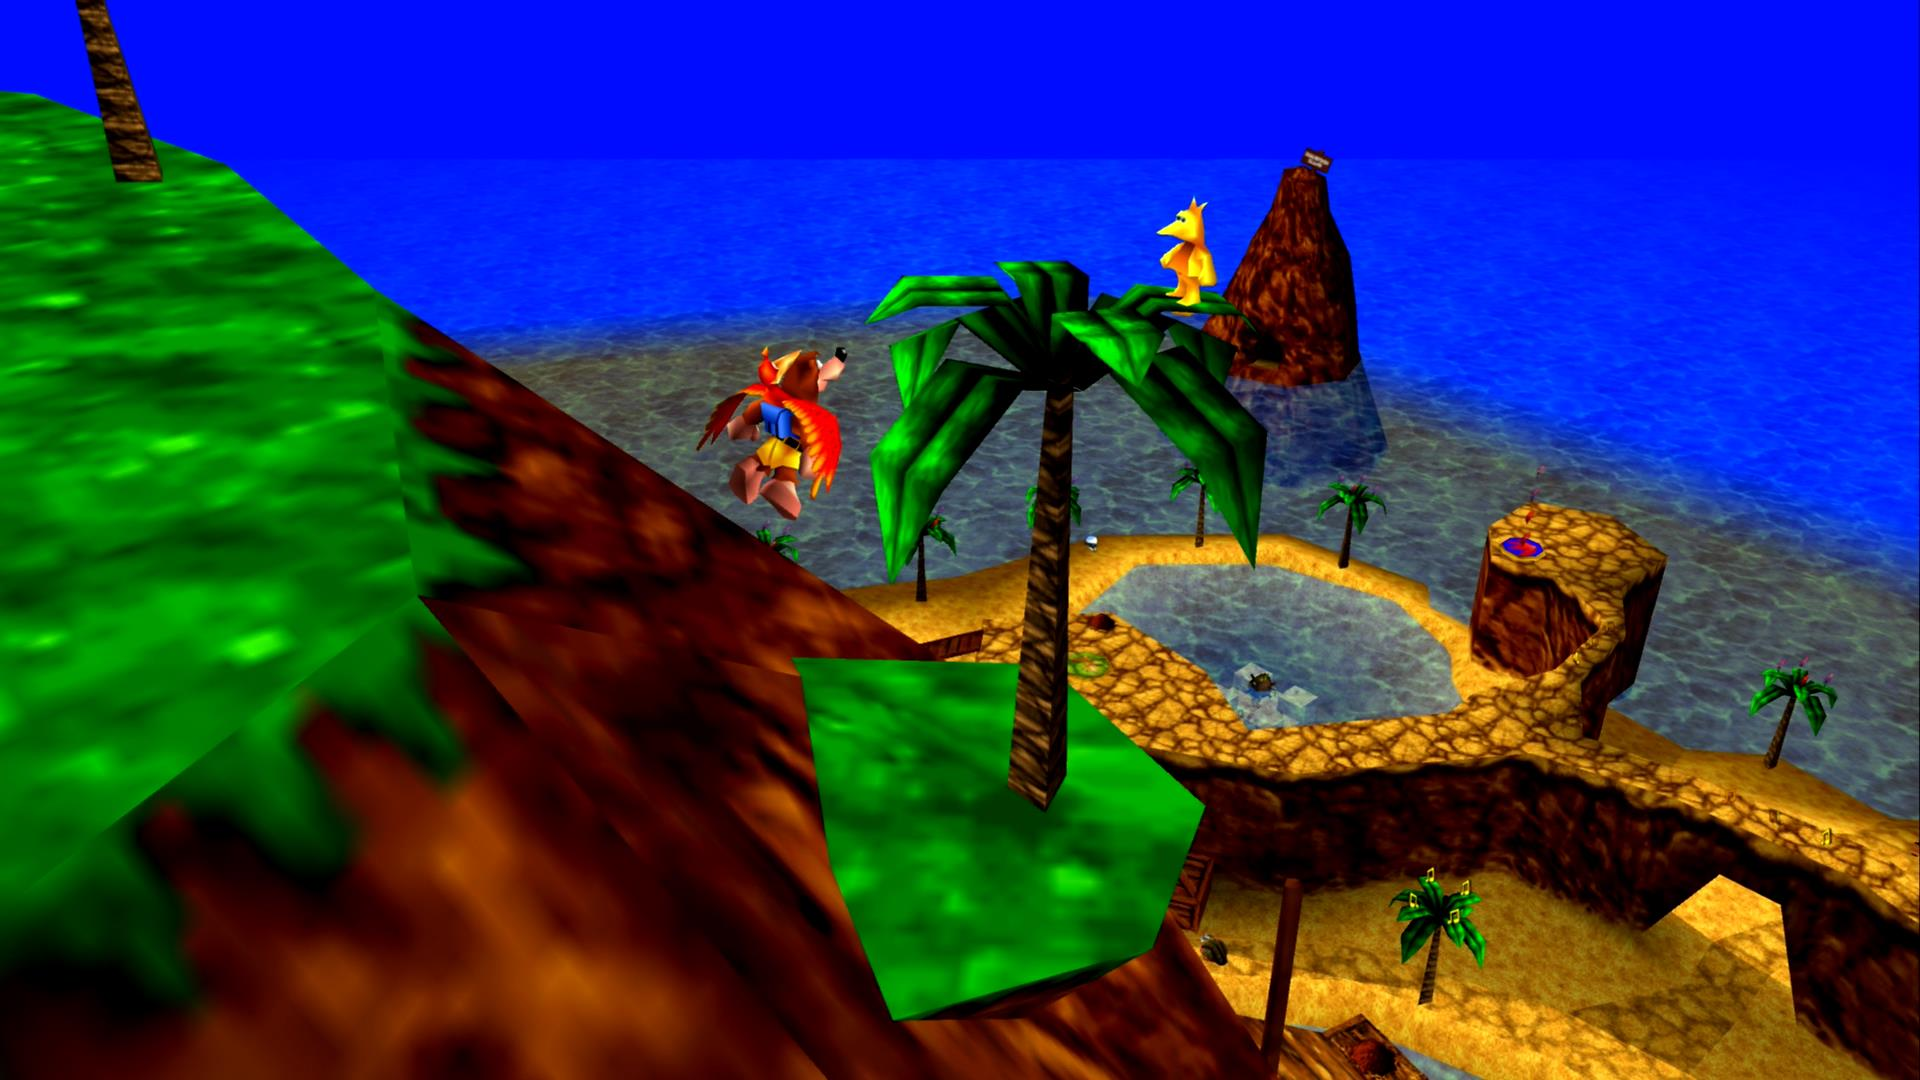 Banjo-Kazooie - Treasure Trove Cave